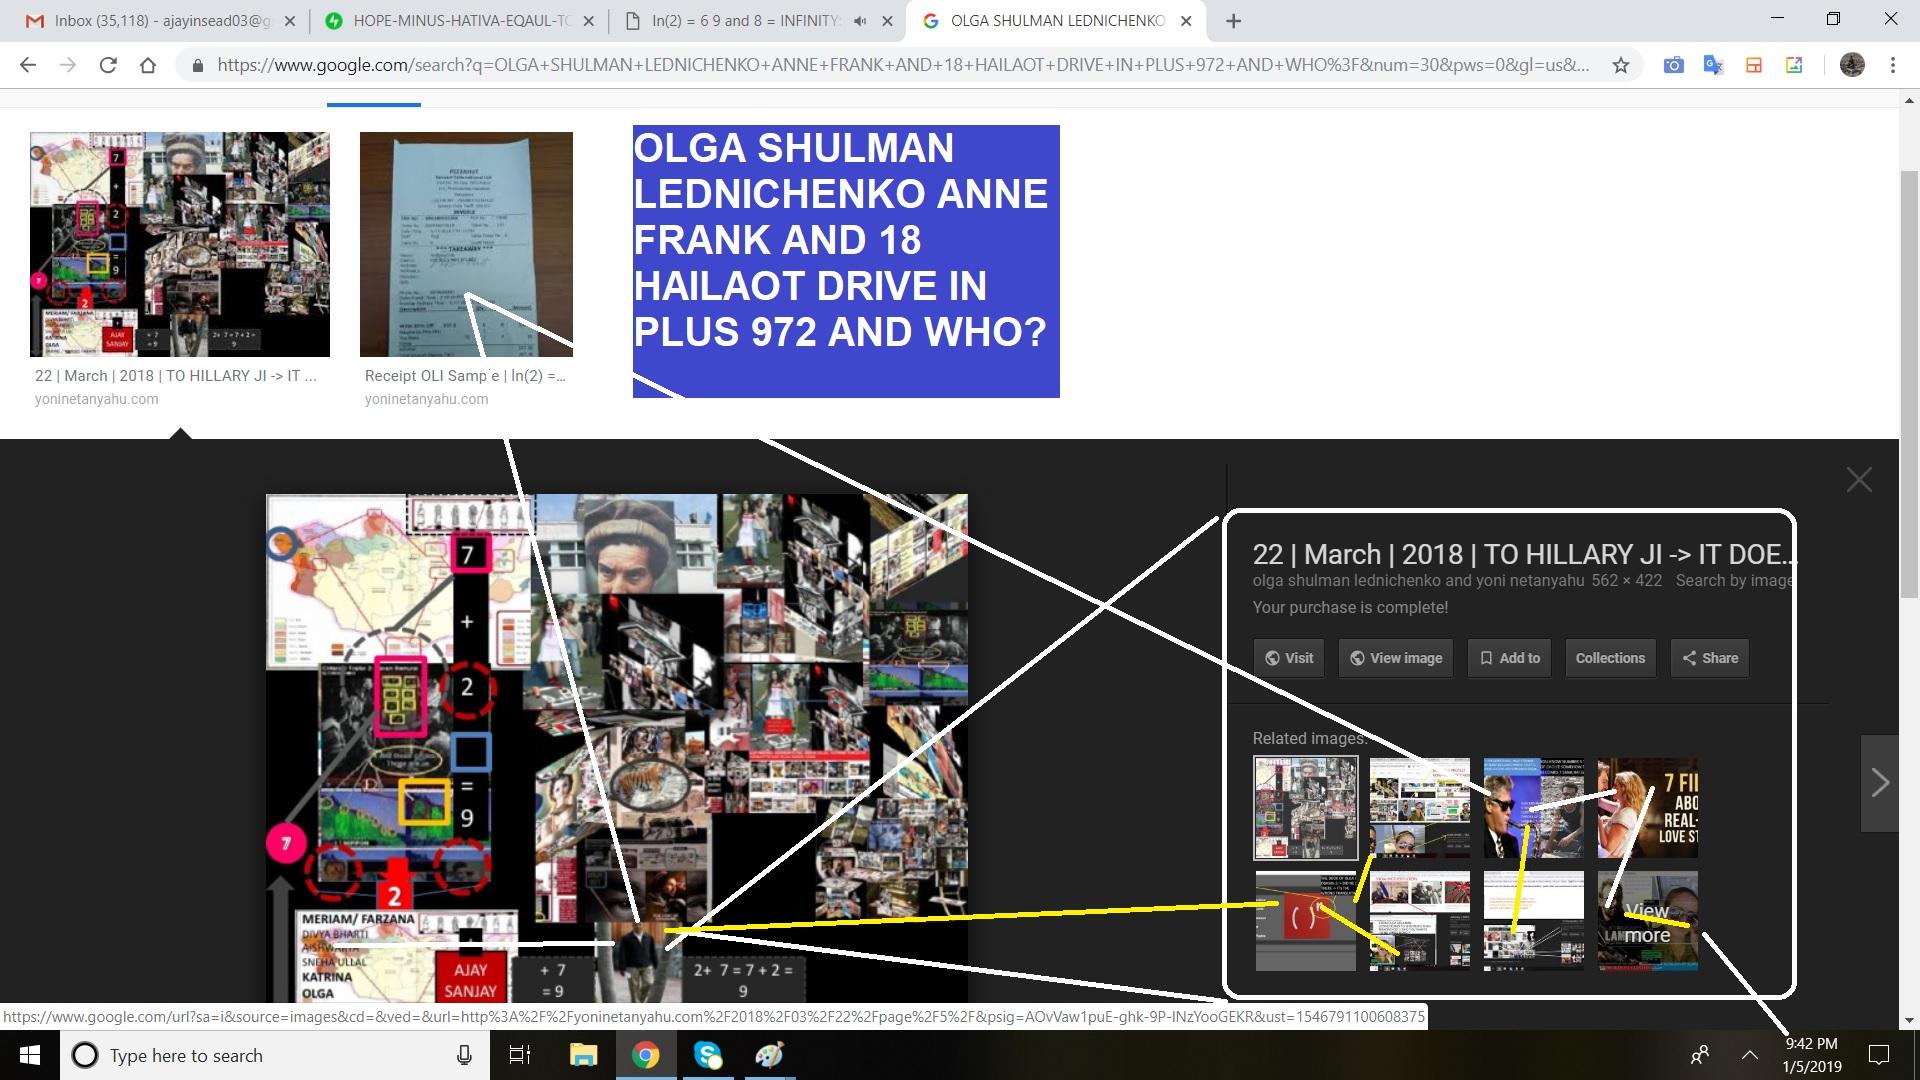 olga shulman lednichenko anne frank and 18 hailaot drive in plus 972 and who